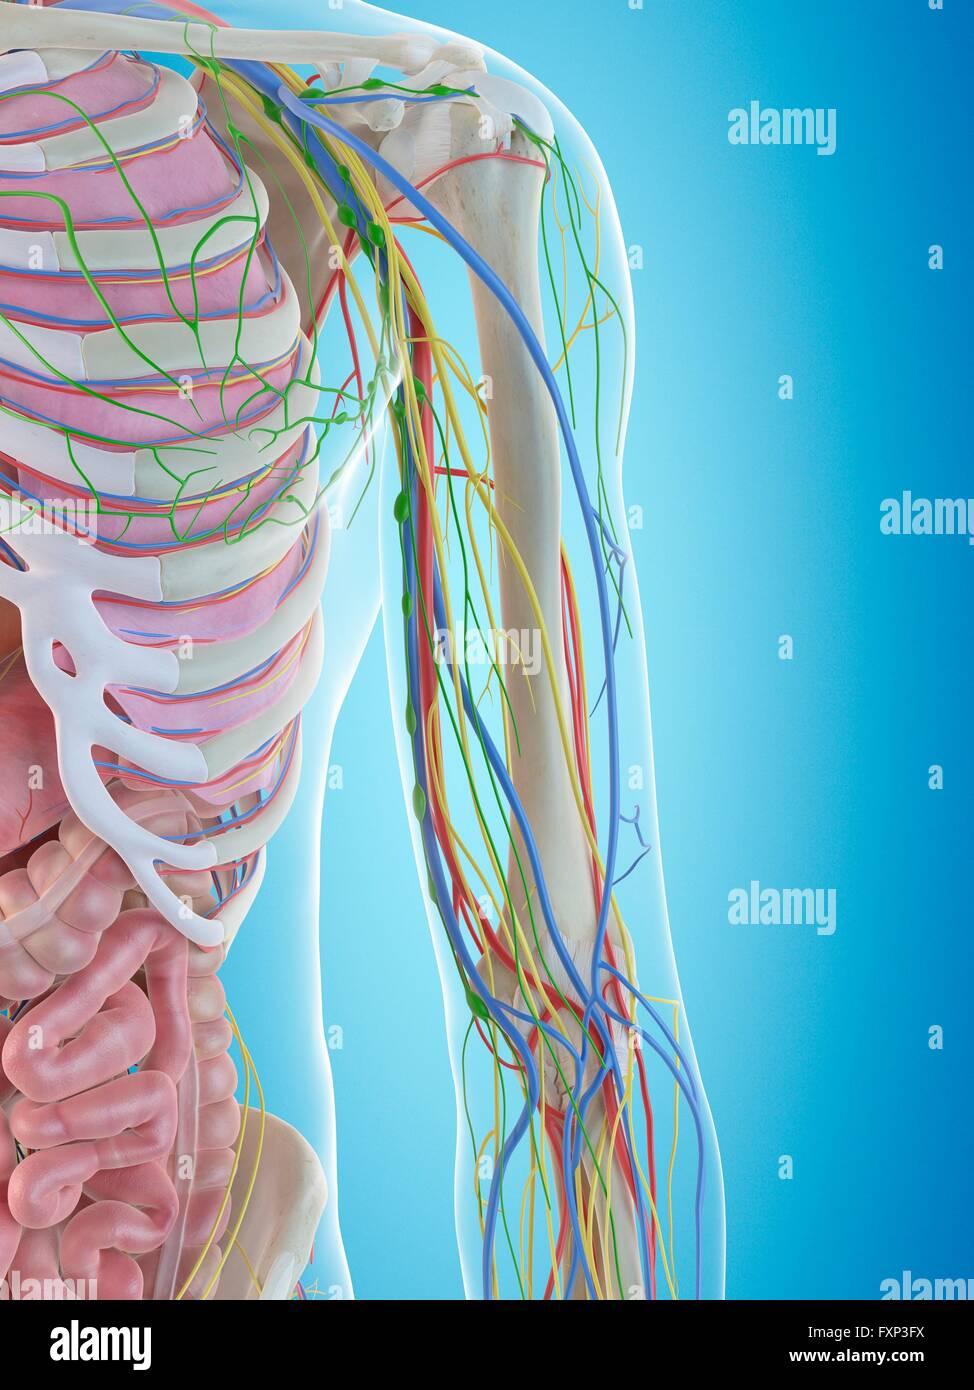 Arm Arteries Artwork Stockfotos & Arm Arteries Artwork Bilder - Alamy